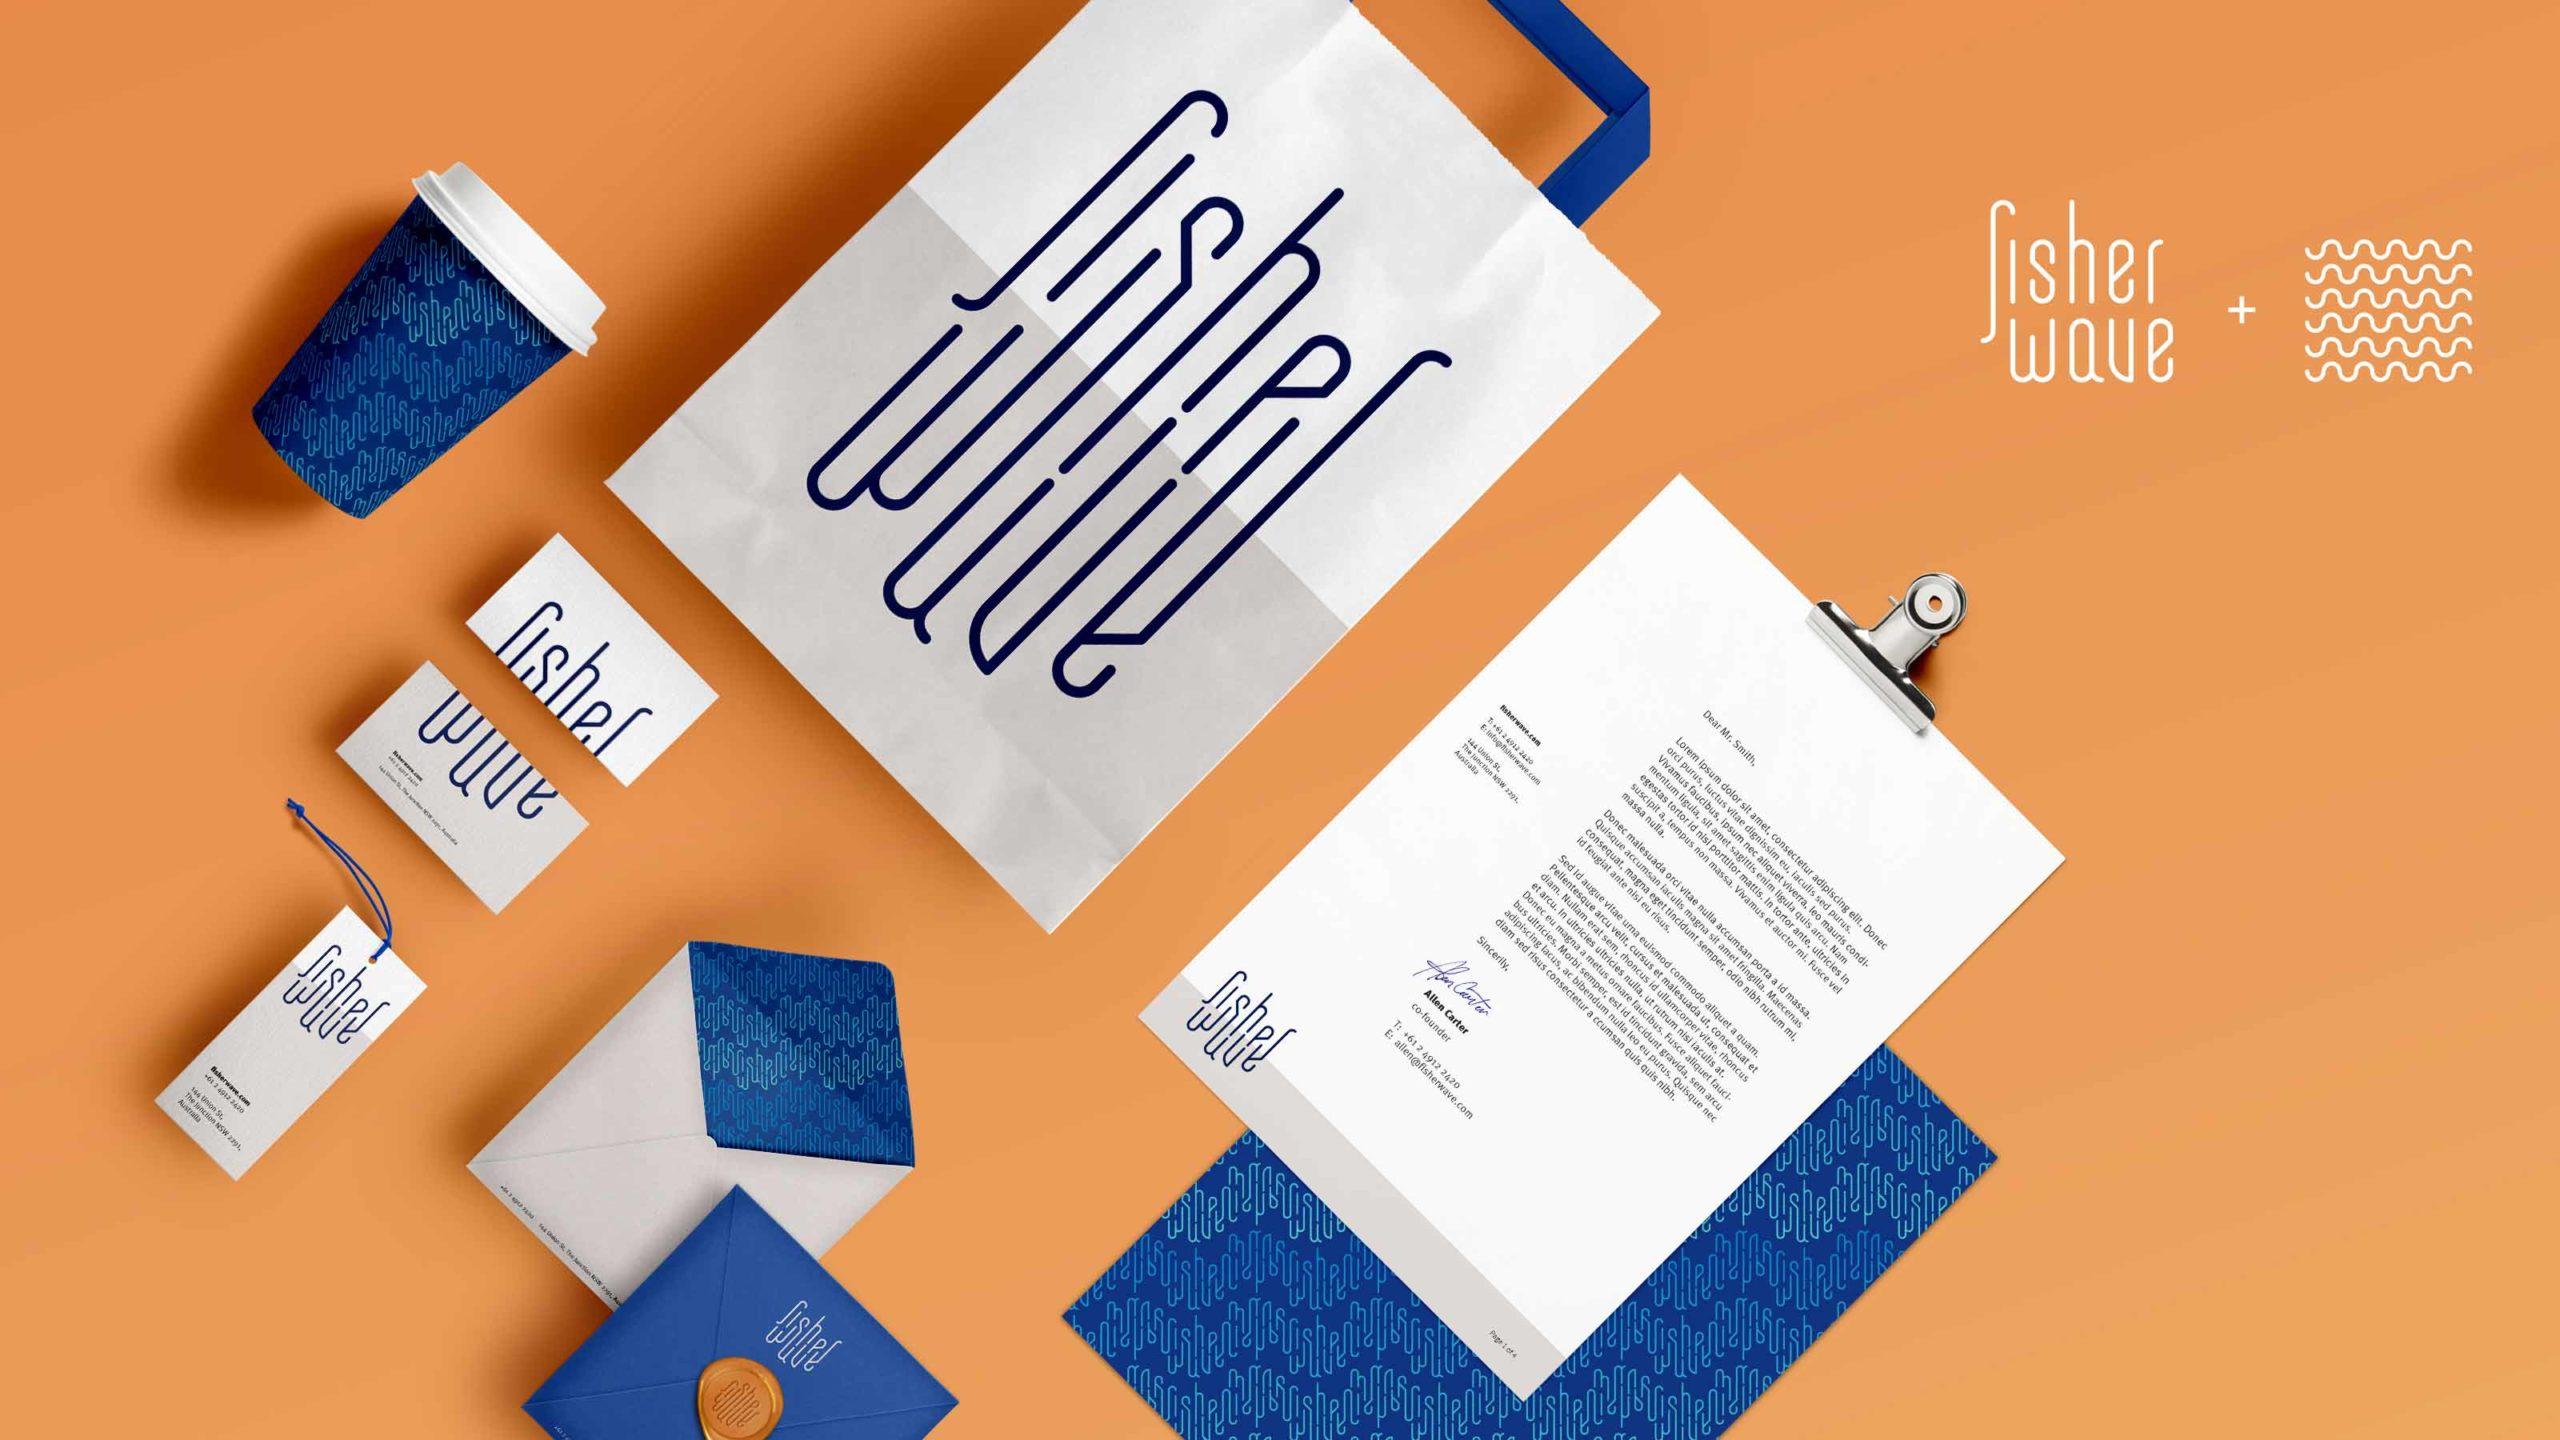 Fisher identity design; stationery and logo